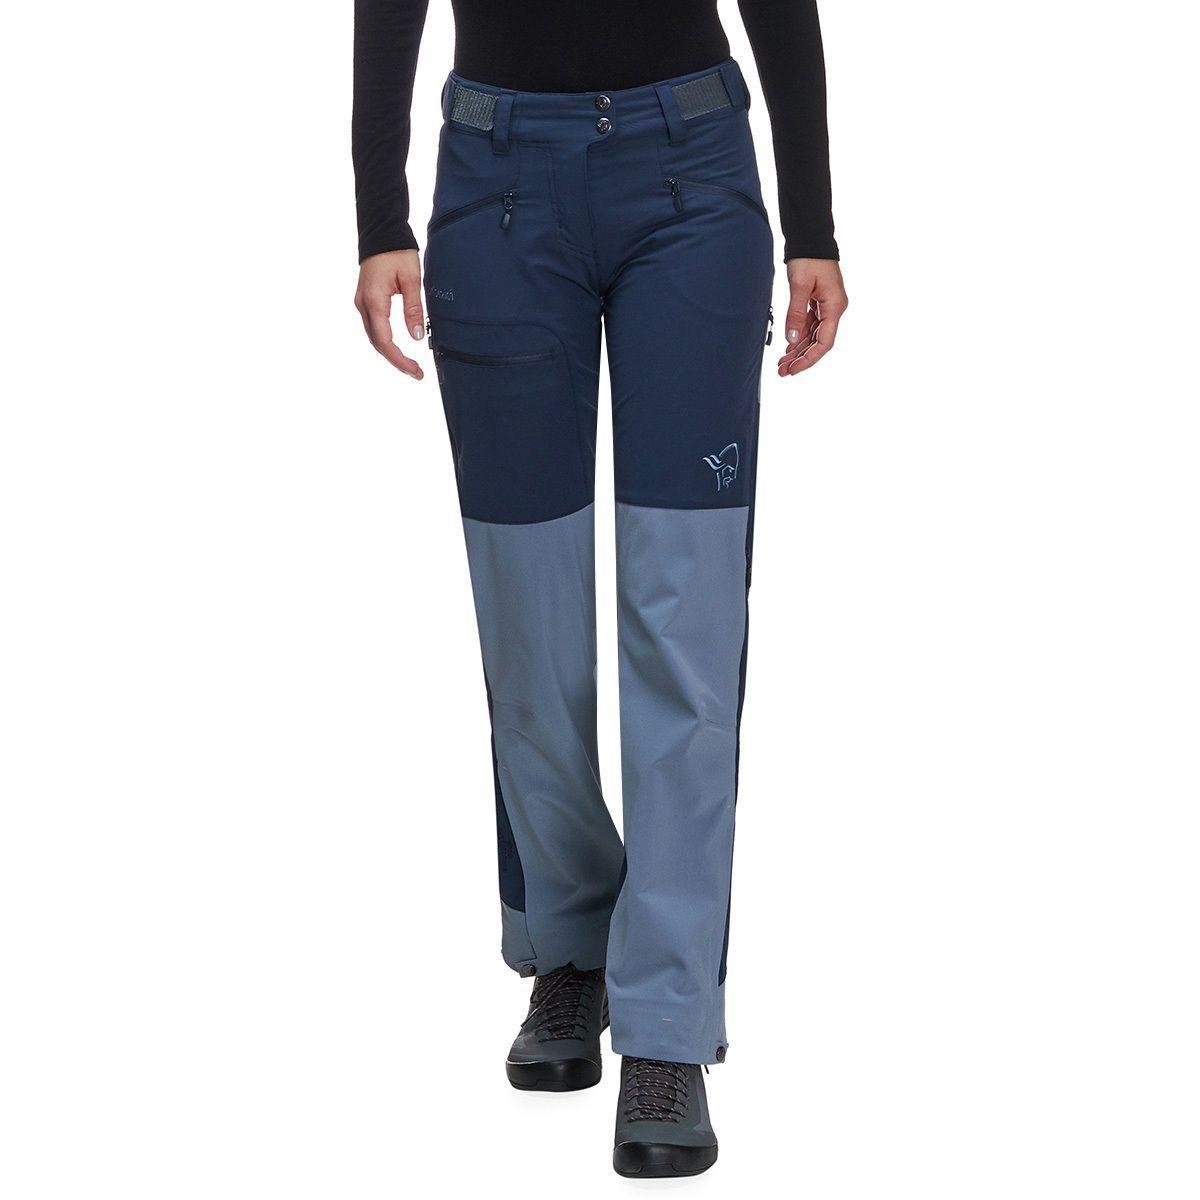 Norrona falketind Windstopper Hybrid Softshell Pant - Women's